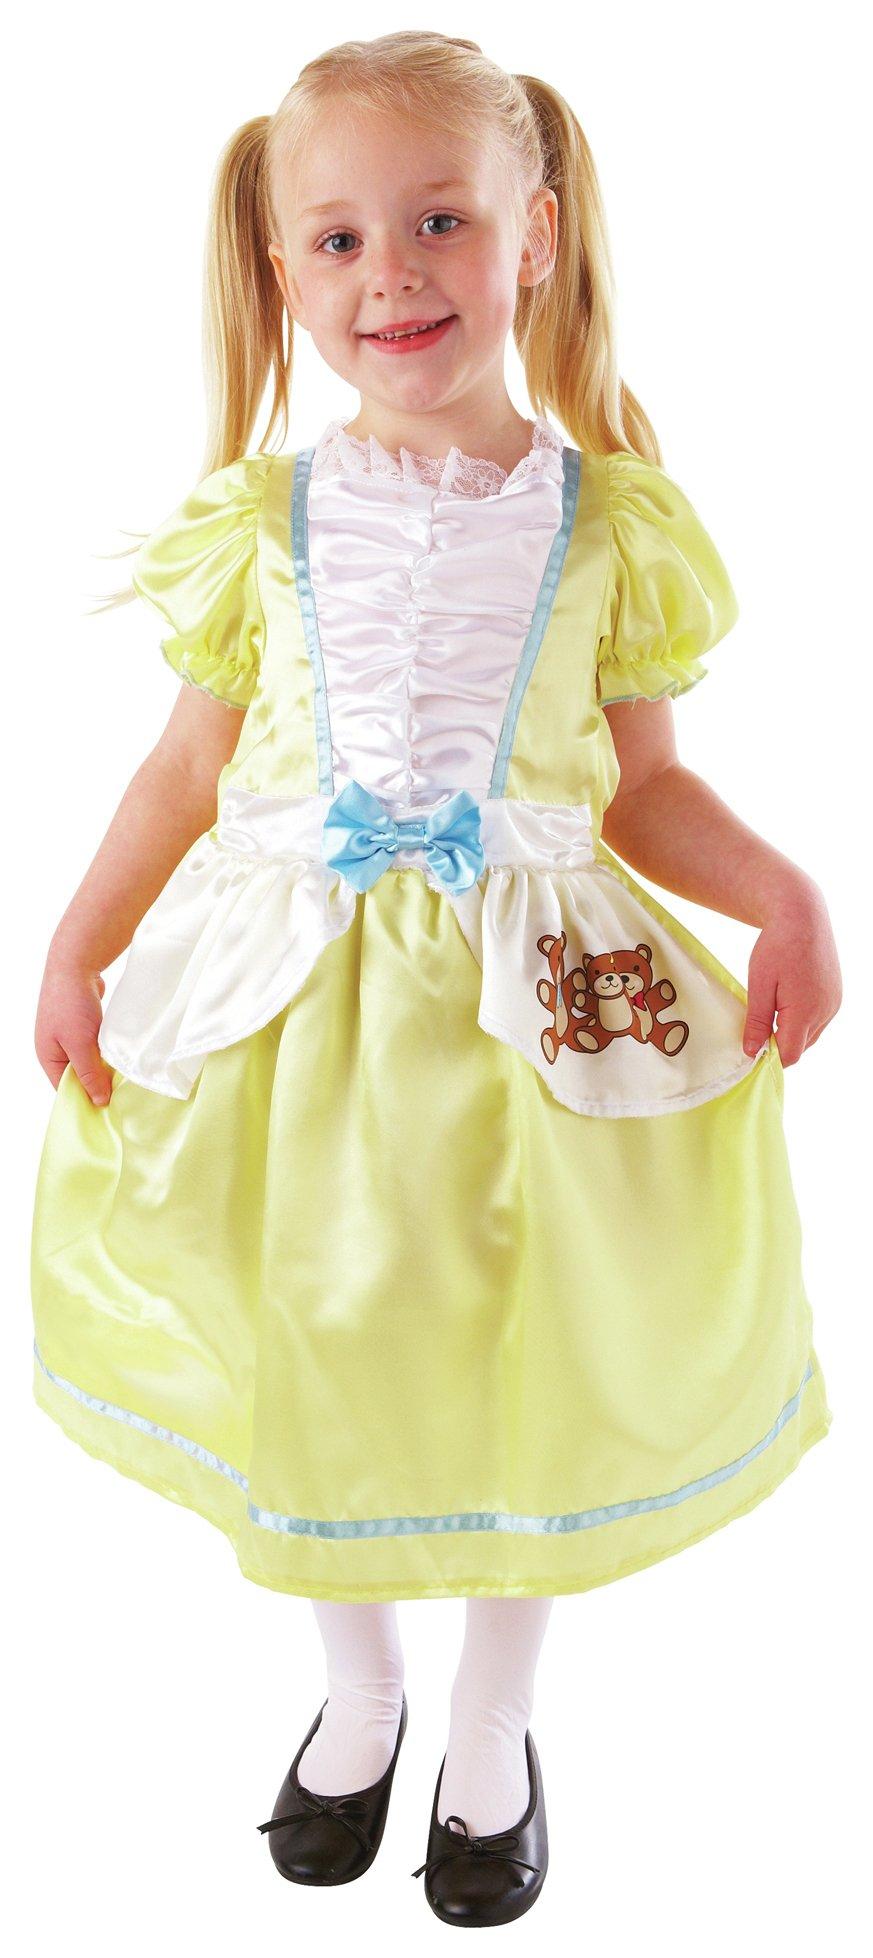 Image of Amscan Goldilocks Costume - 6 - 8 Years.